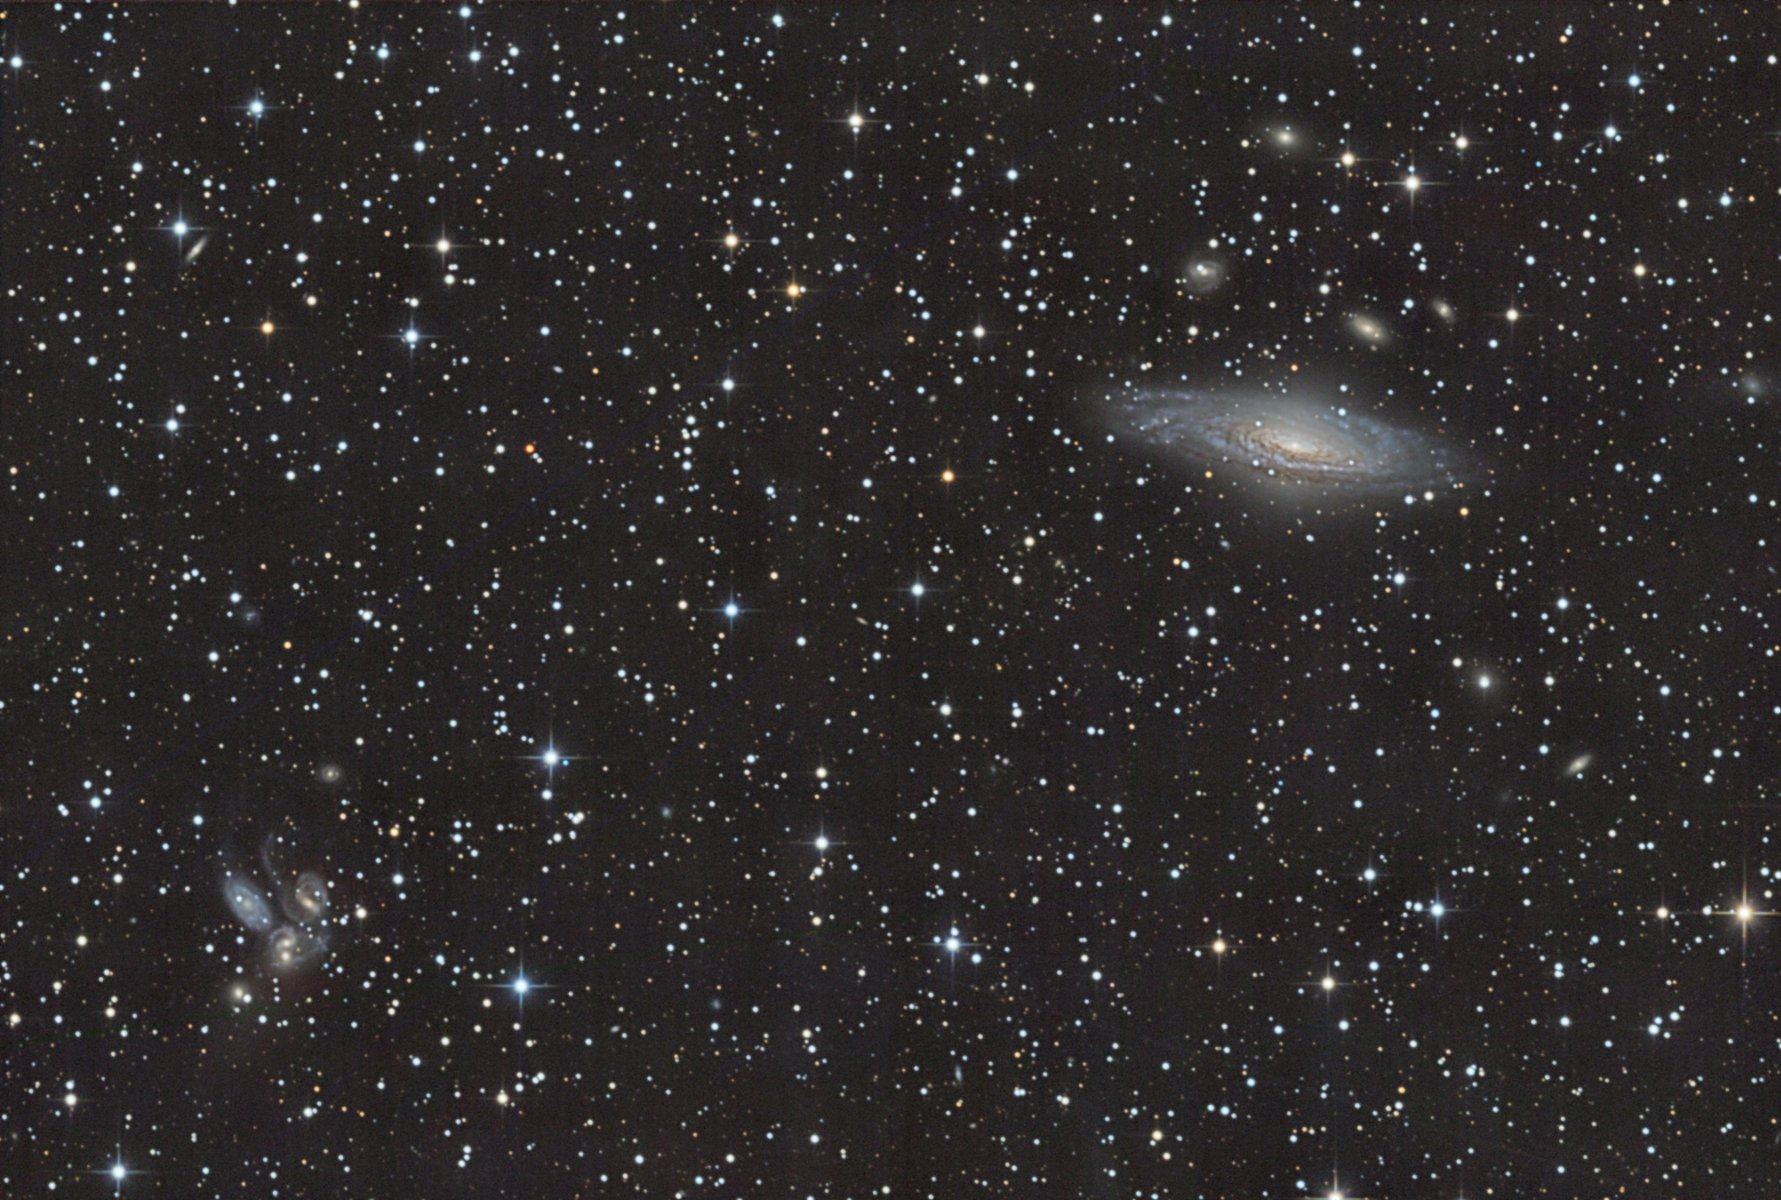 NGC7331-LRGB-PI-PS-BIN2.jpg